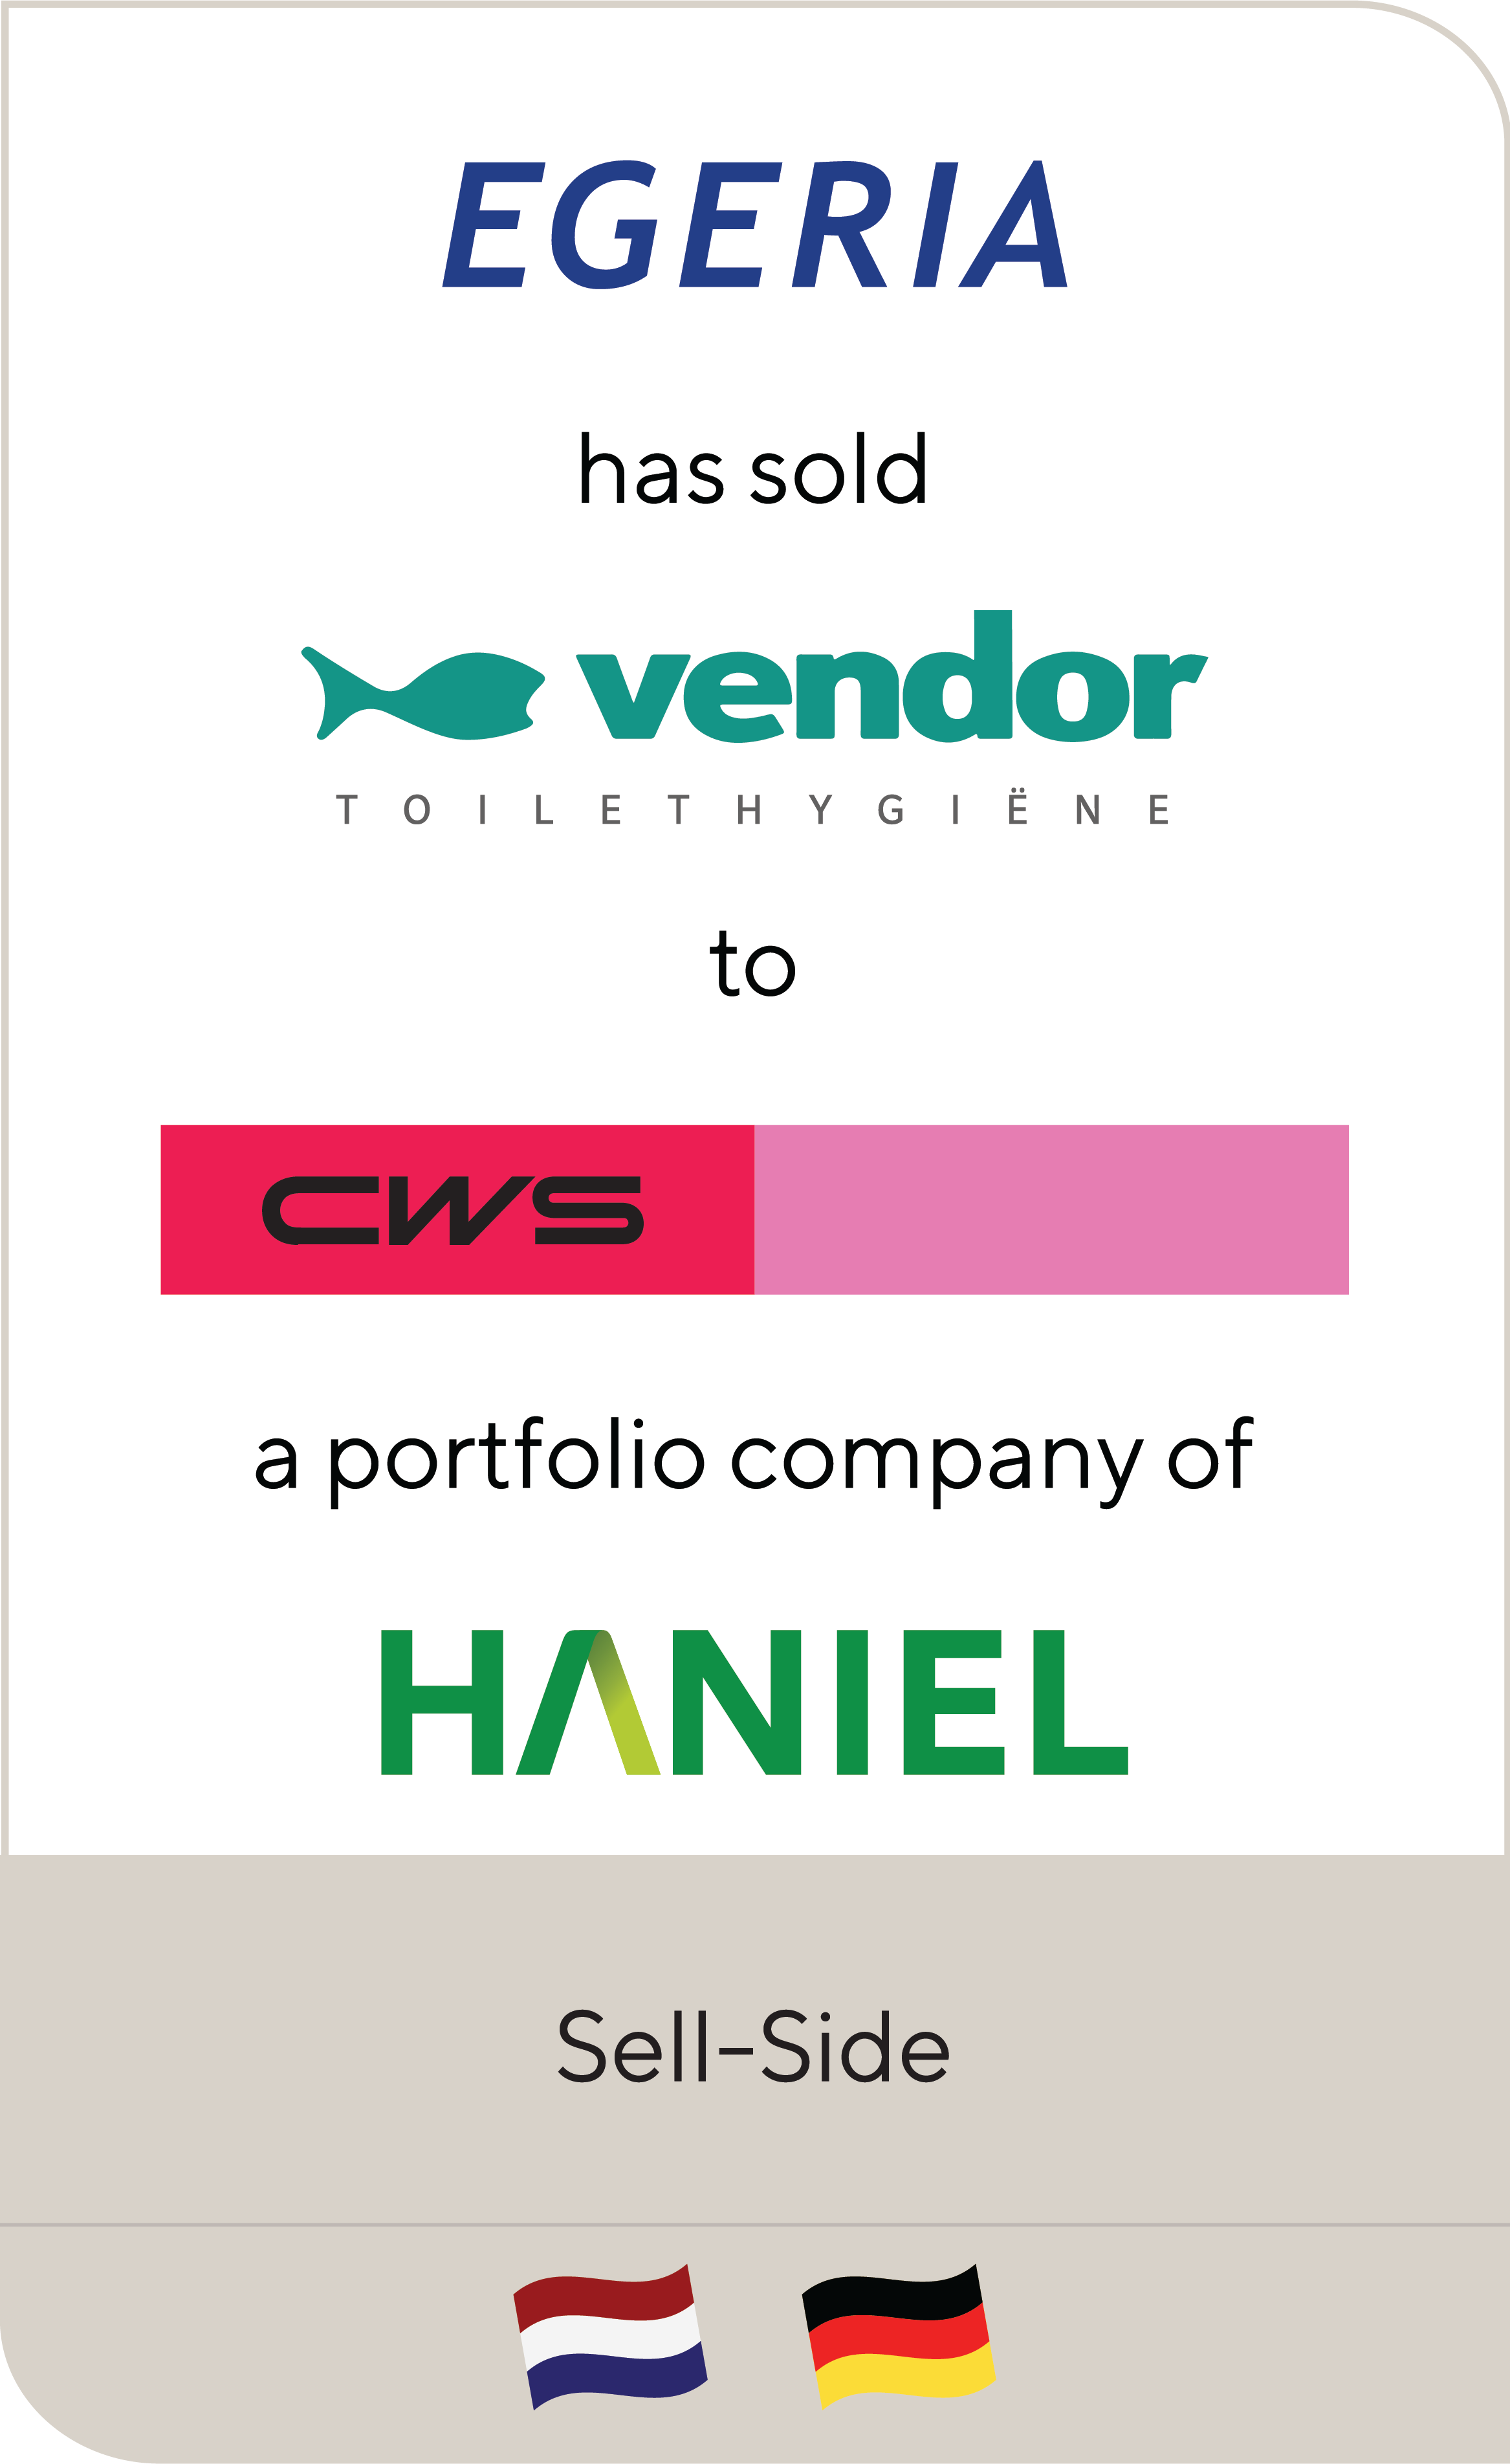 Egeria Vendor CWS Haniel 2019